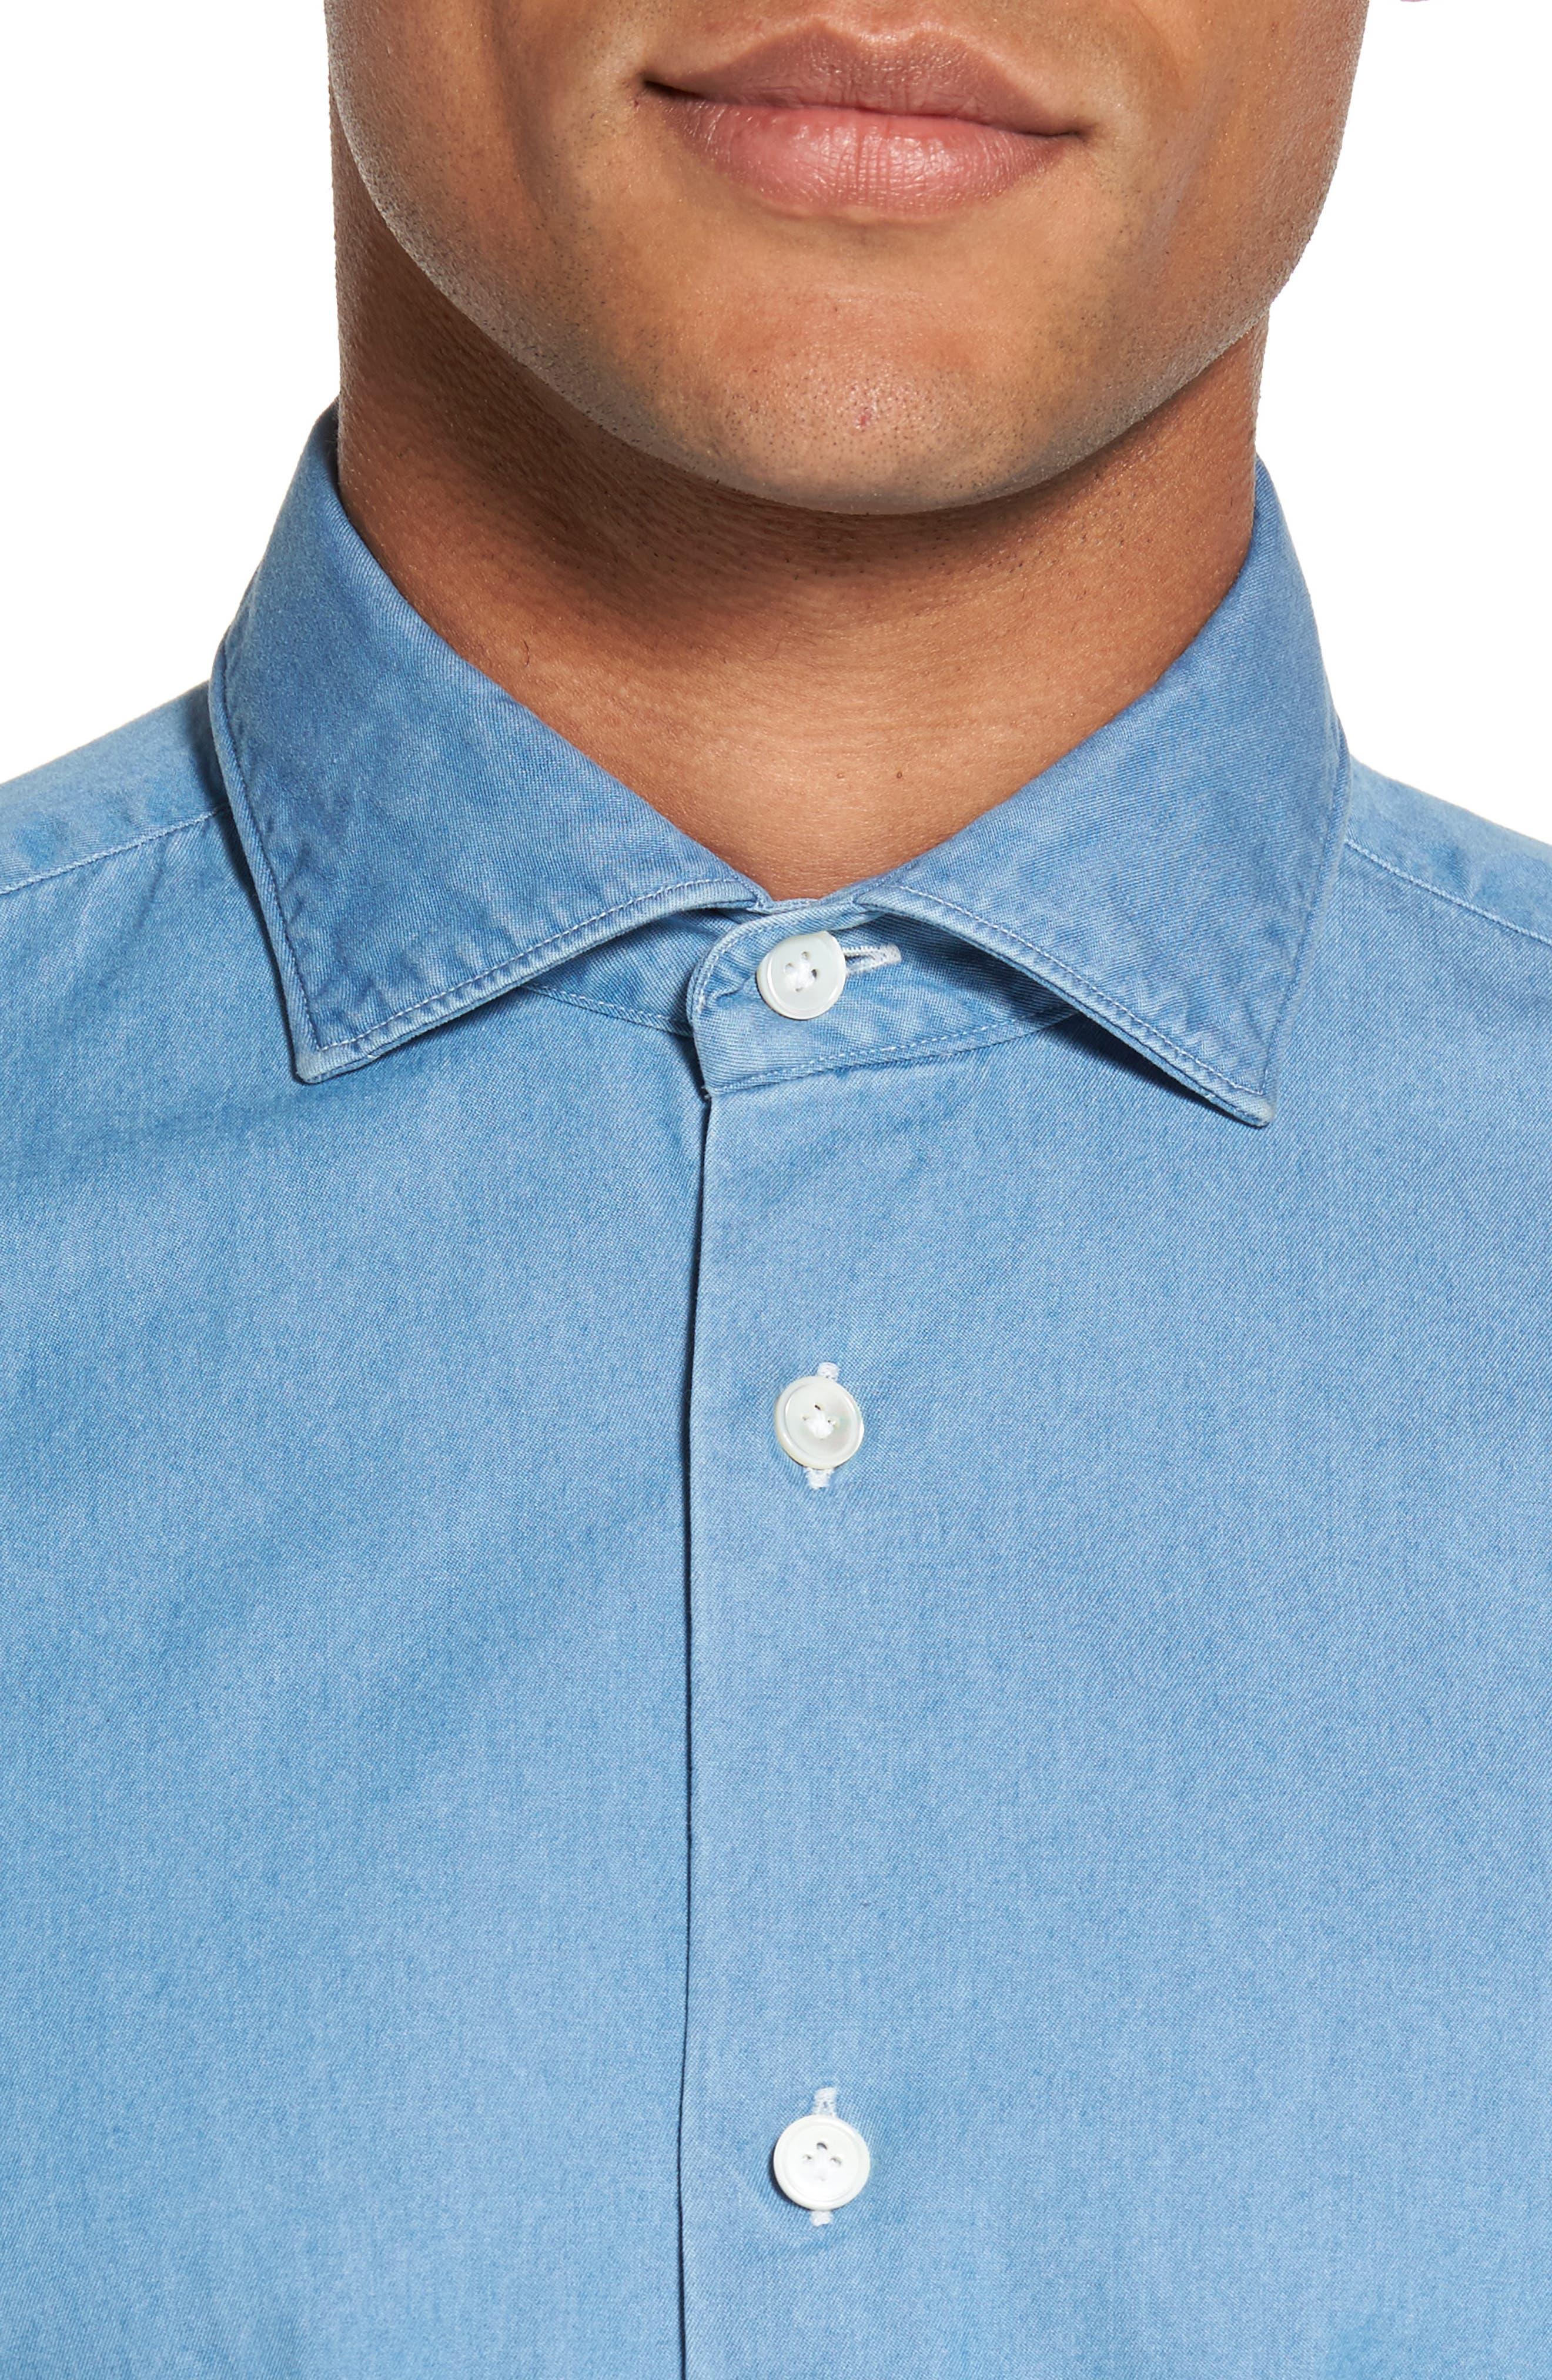 Denim Sport Shirt,                             Alternate thumbnail 4, color,                             Denim